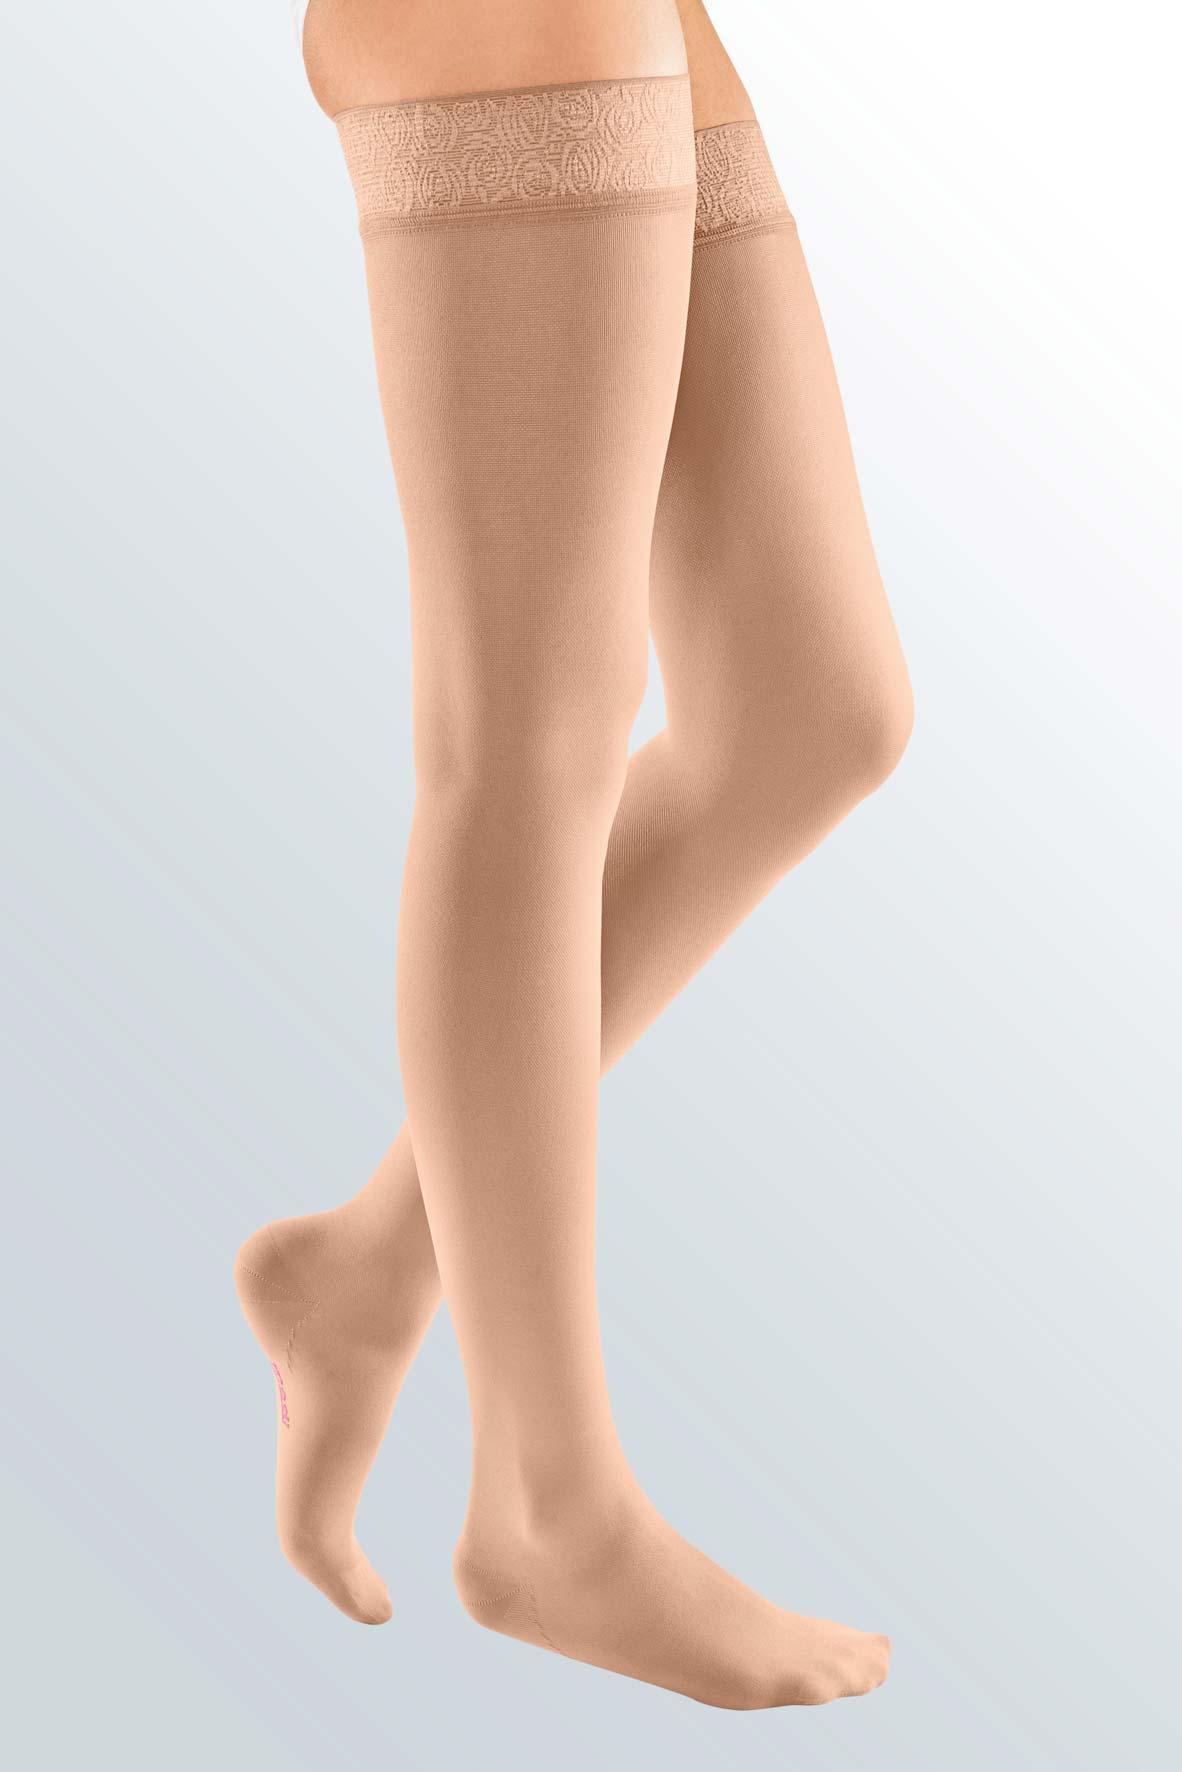 mediven elegance - stehenní punčochy (II. KT)  12806f4db8